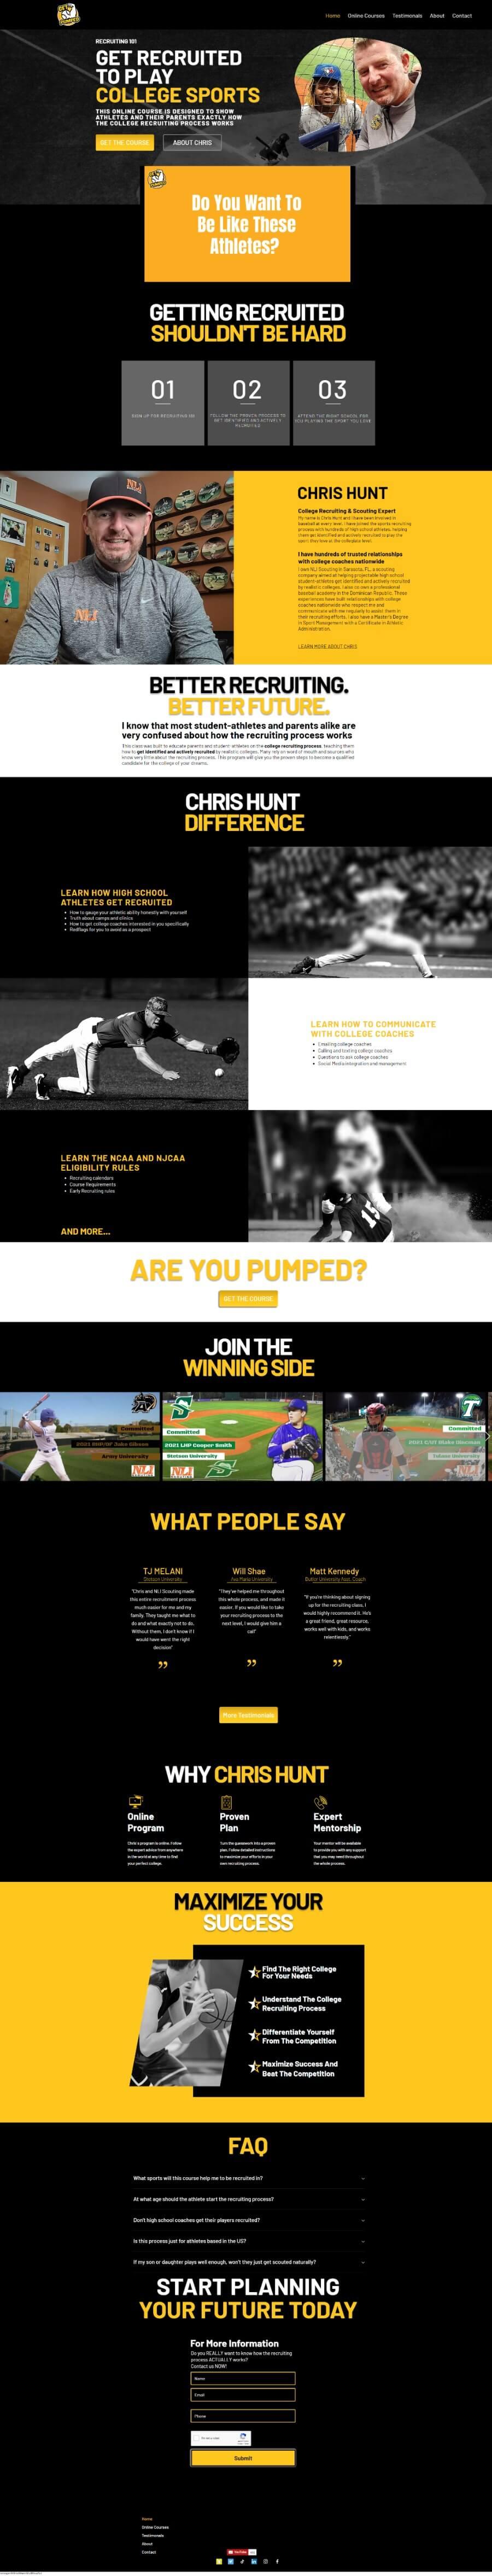 Sport company training course website optimized by TJG Web Design